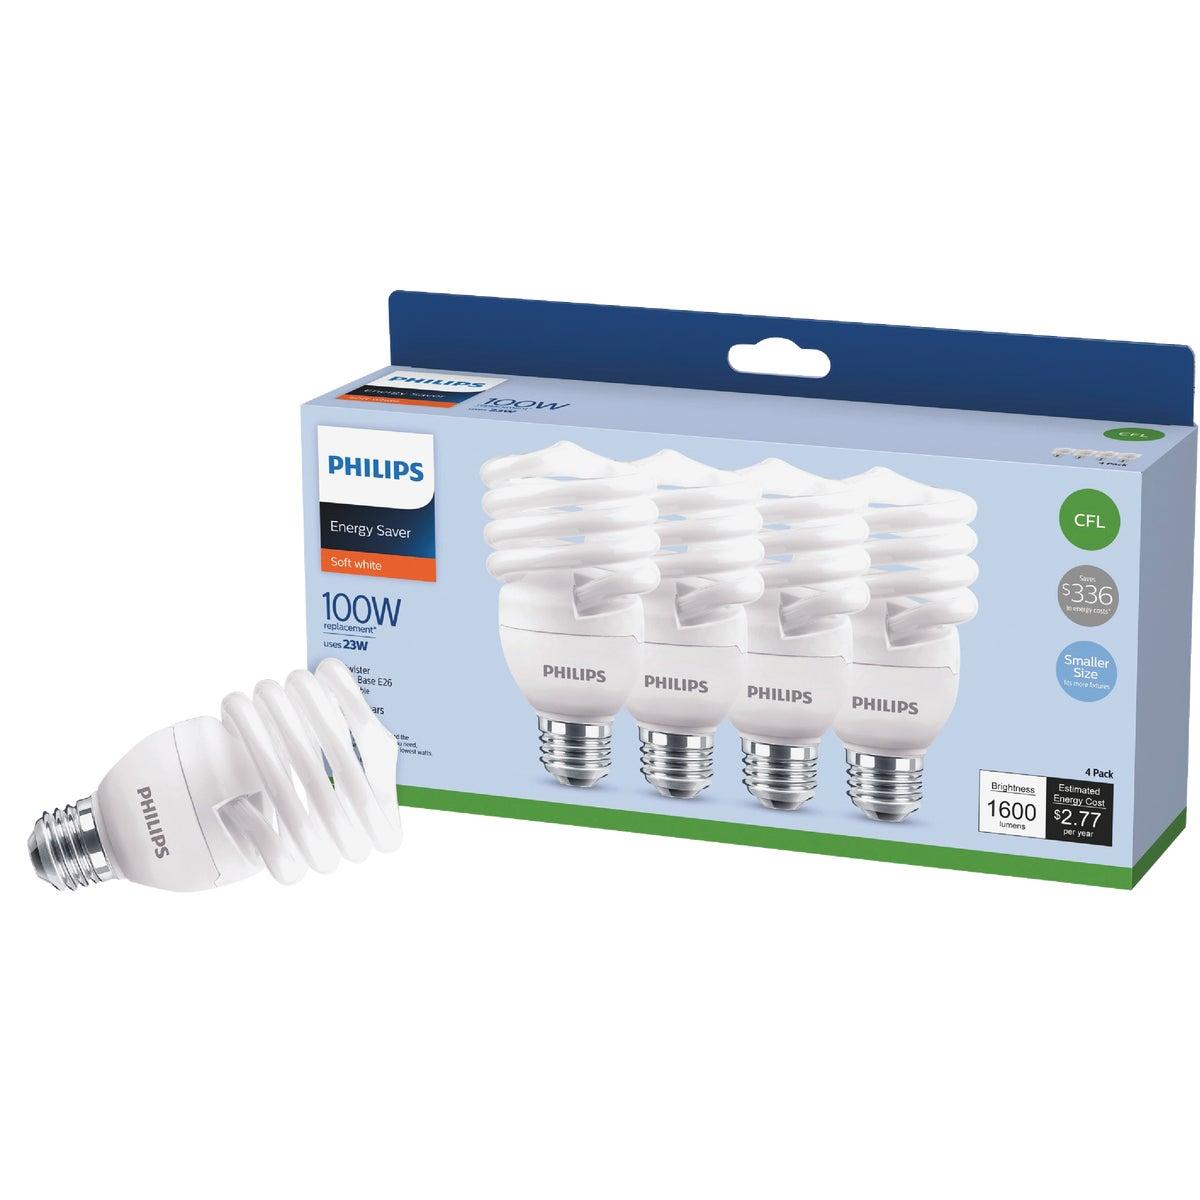 GE Lighting 5PK 26W CFL BULB 97250 FLE26HT3/2/5W-5PK